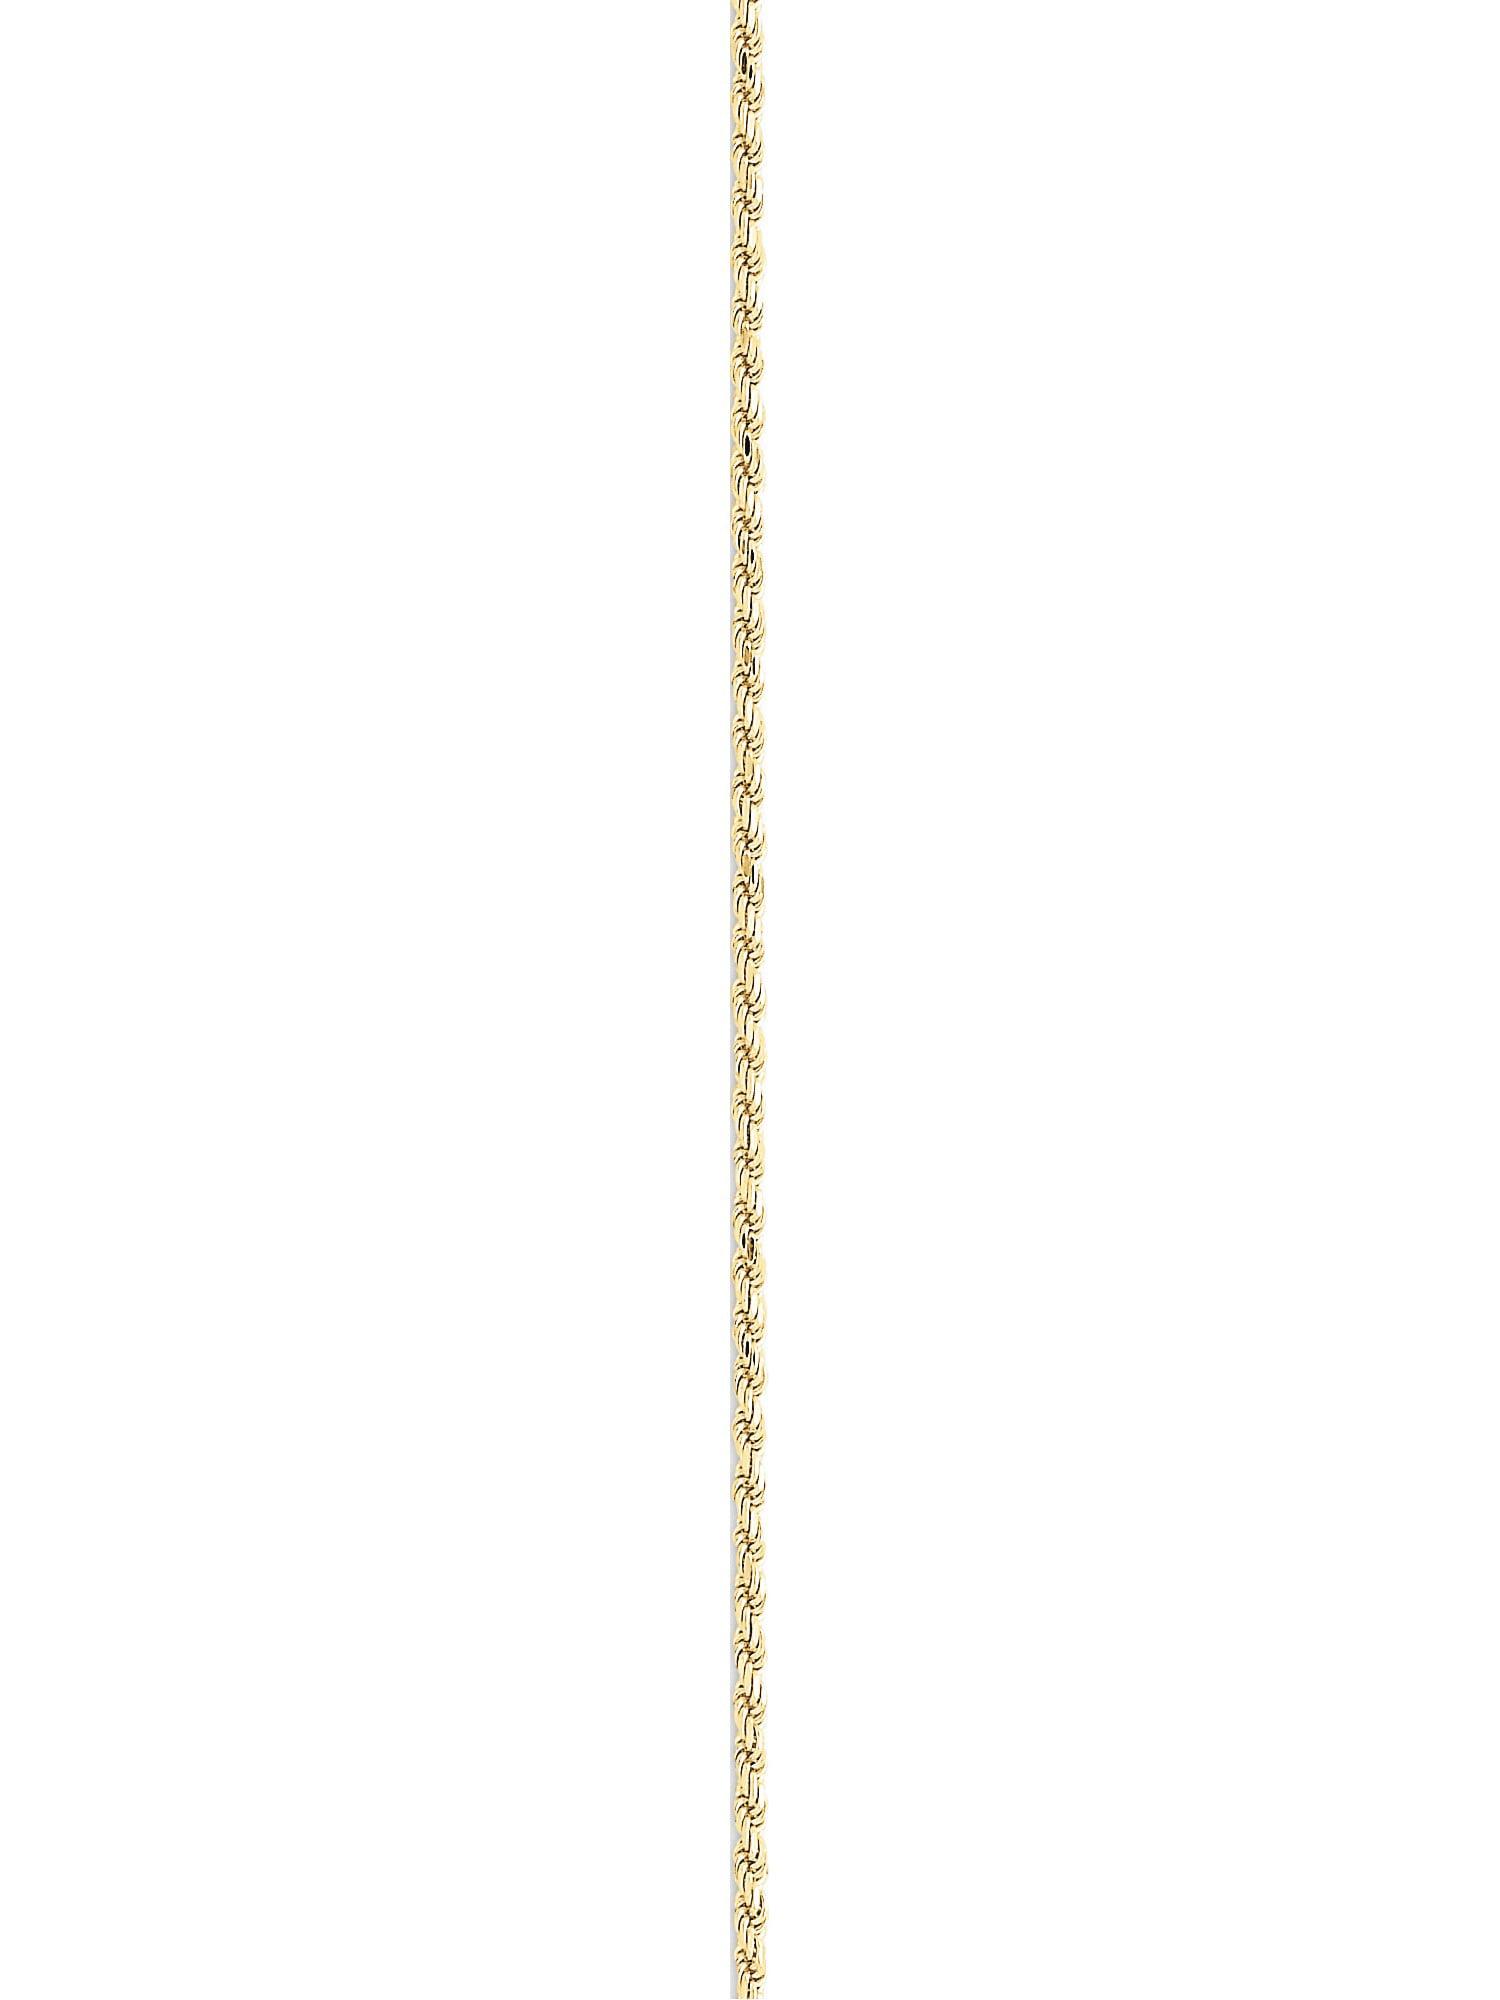 b46e1b9fece 10k Yellow Gold 2mm Machine Made Diamond Cut Rope Chain